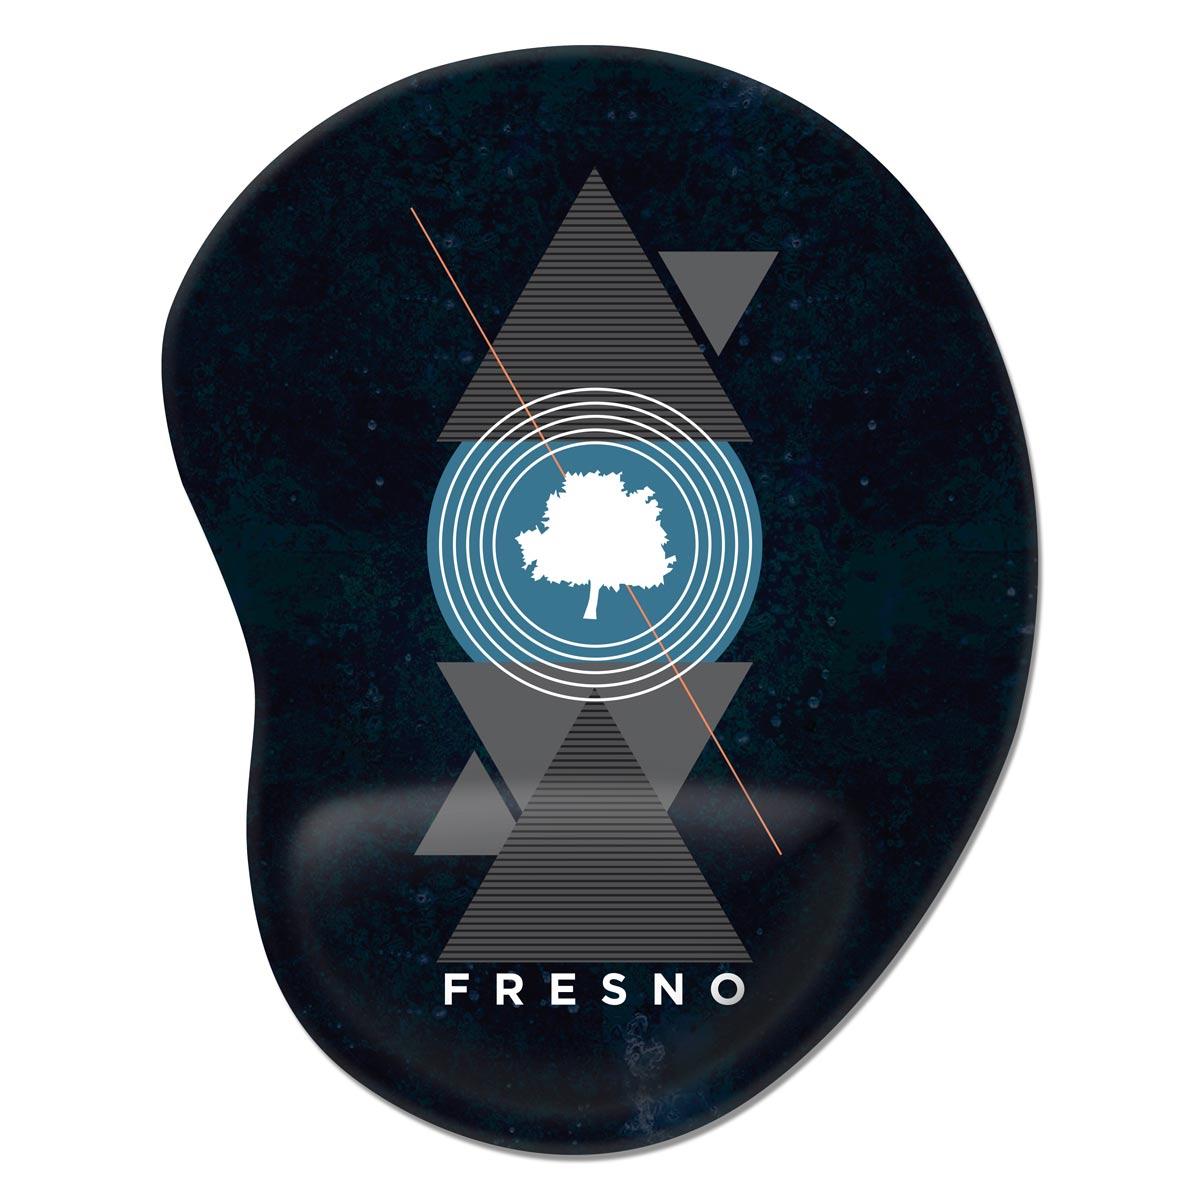 Mousepad Fresno Geometric